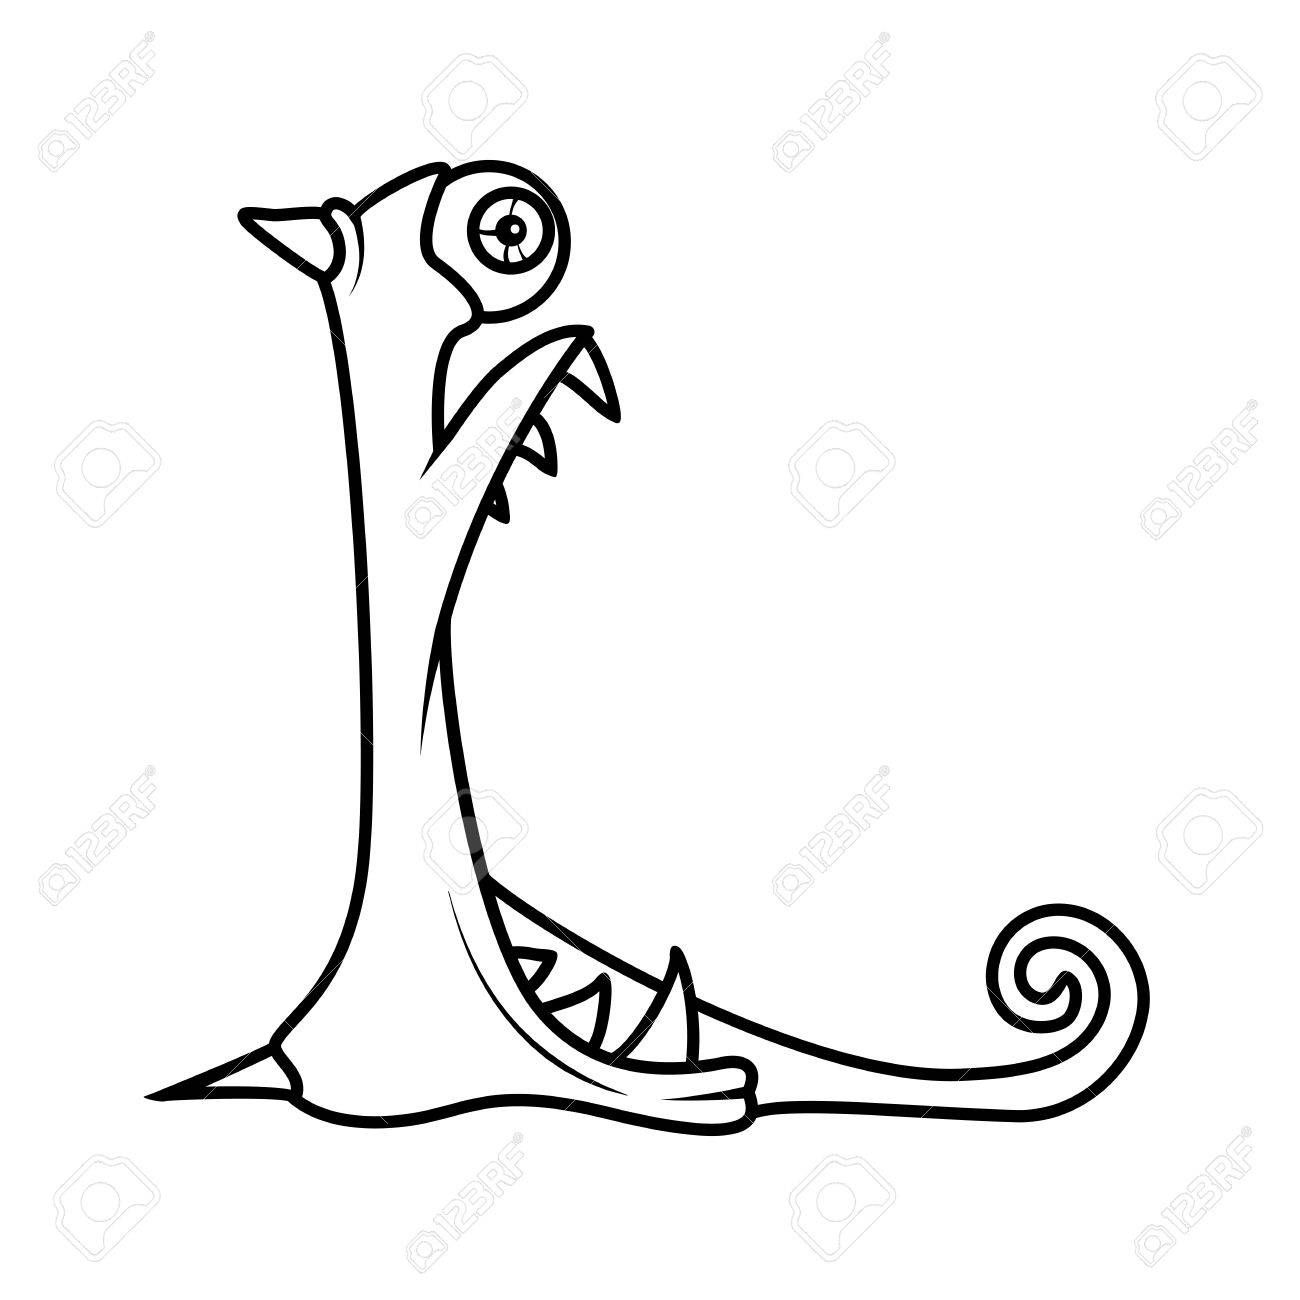 Monster alphabet coloring pages letter l